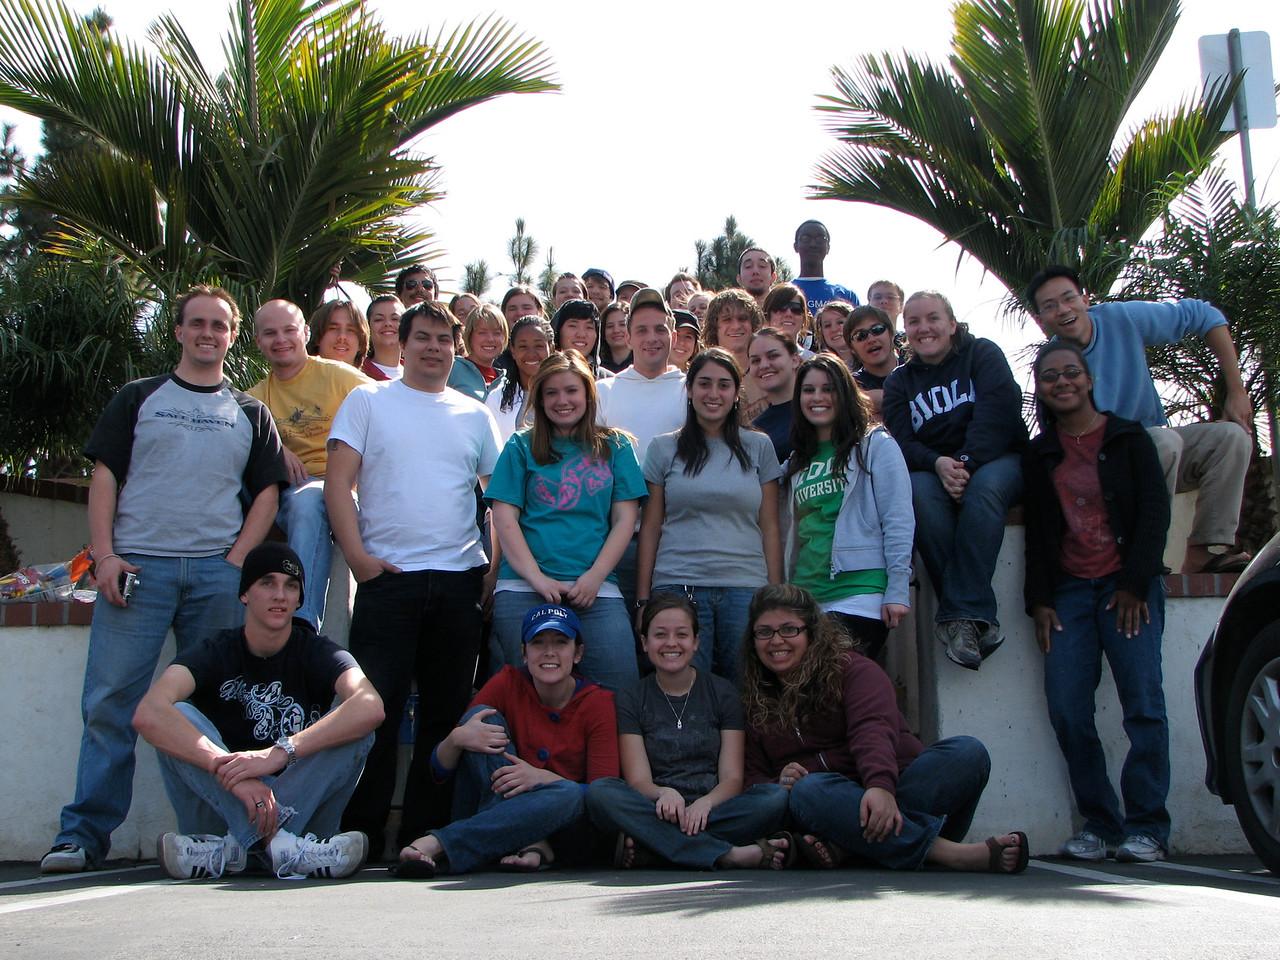 2007 03 03 Sat - Group pic 3